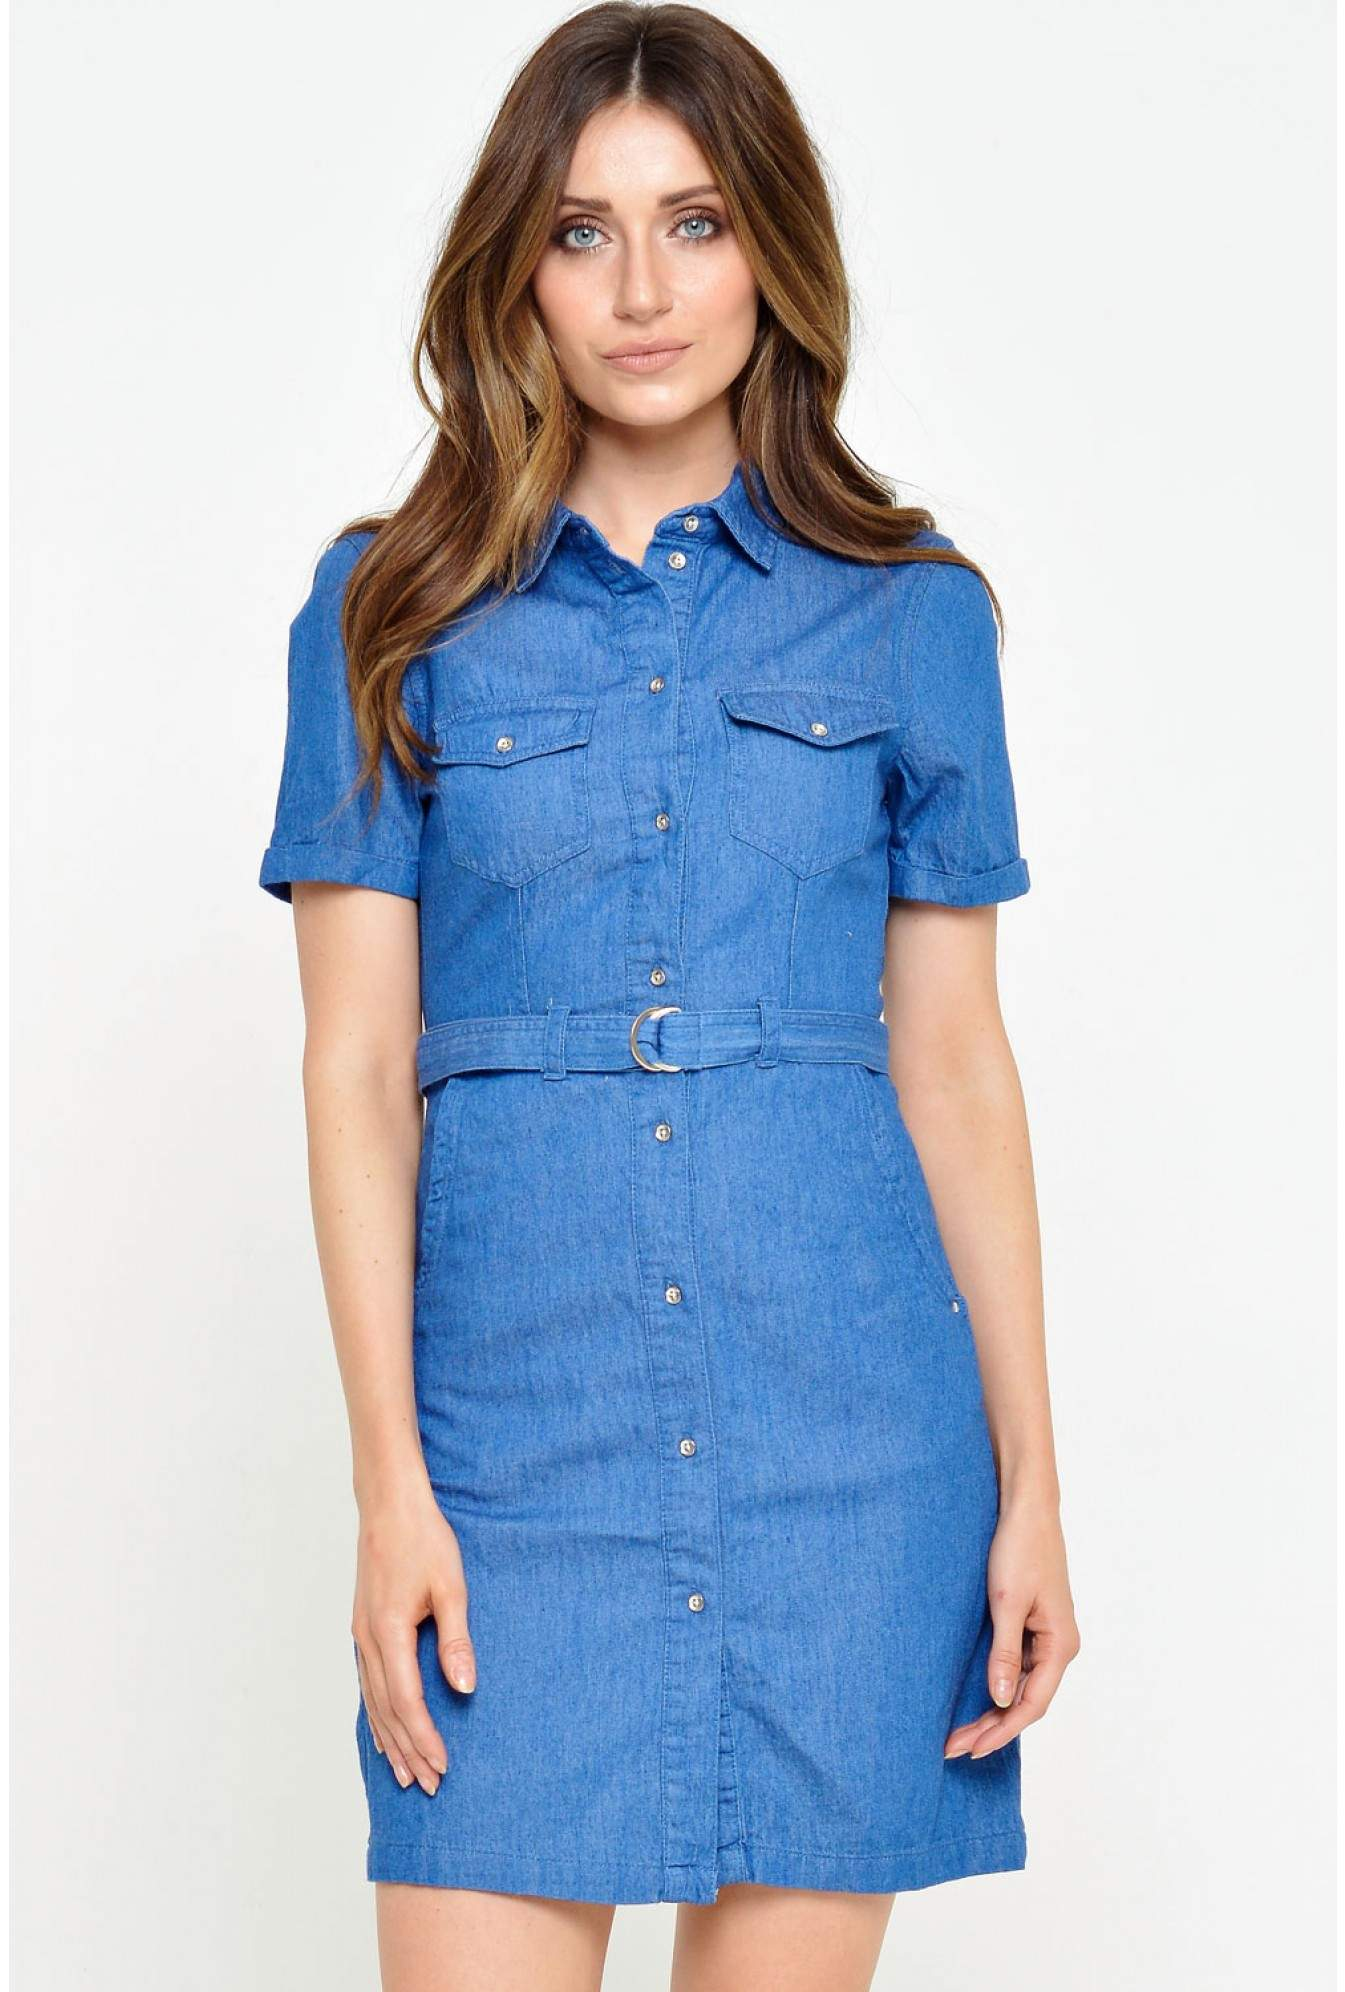 5fd7628ce69824 More Views. Vera SS Denim Short Belt Dress in Medium Blue. Vero Moda